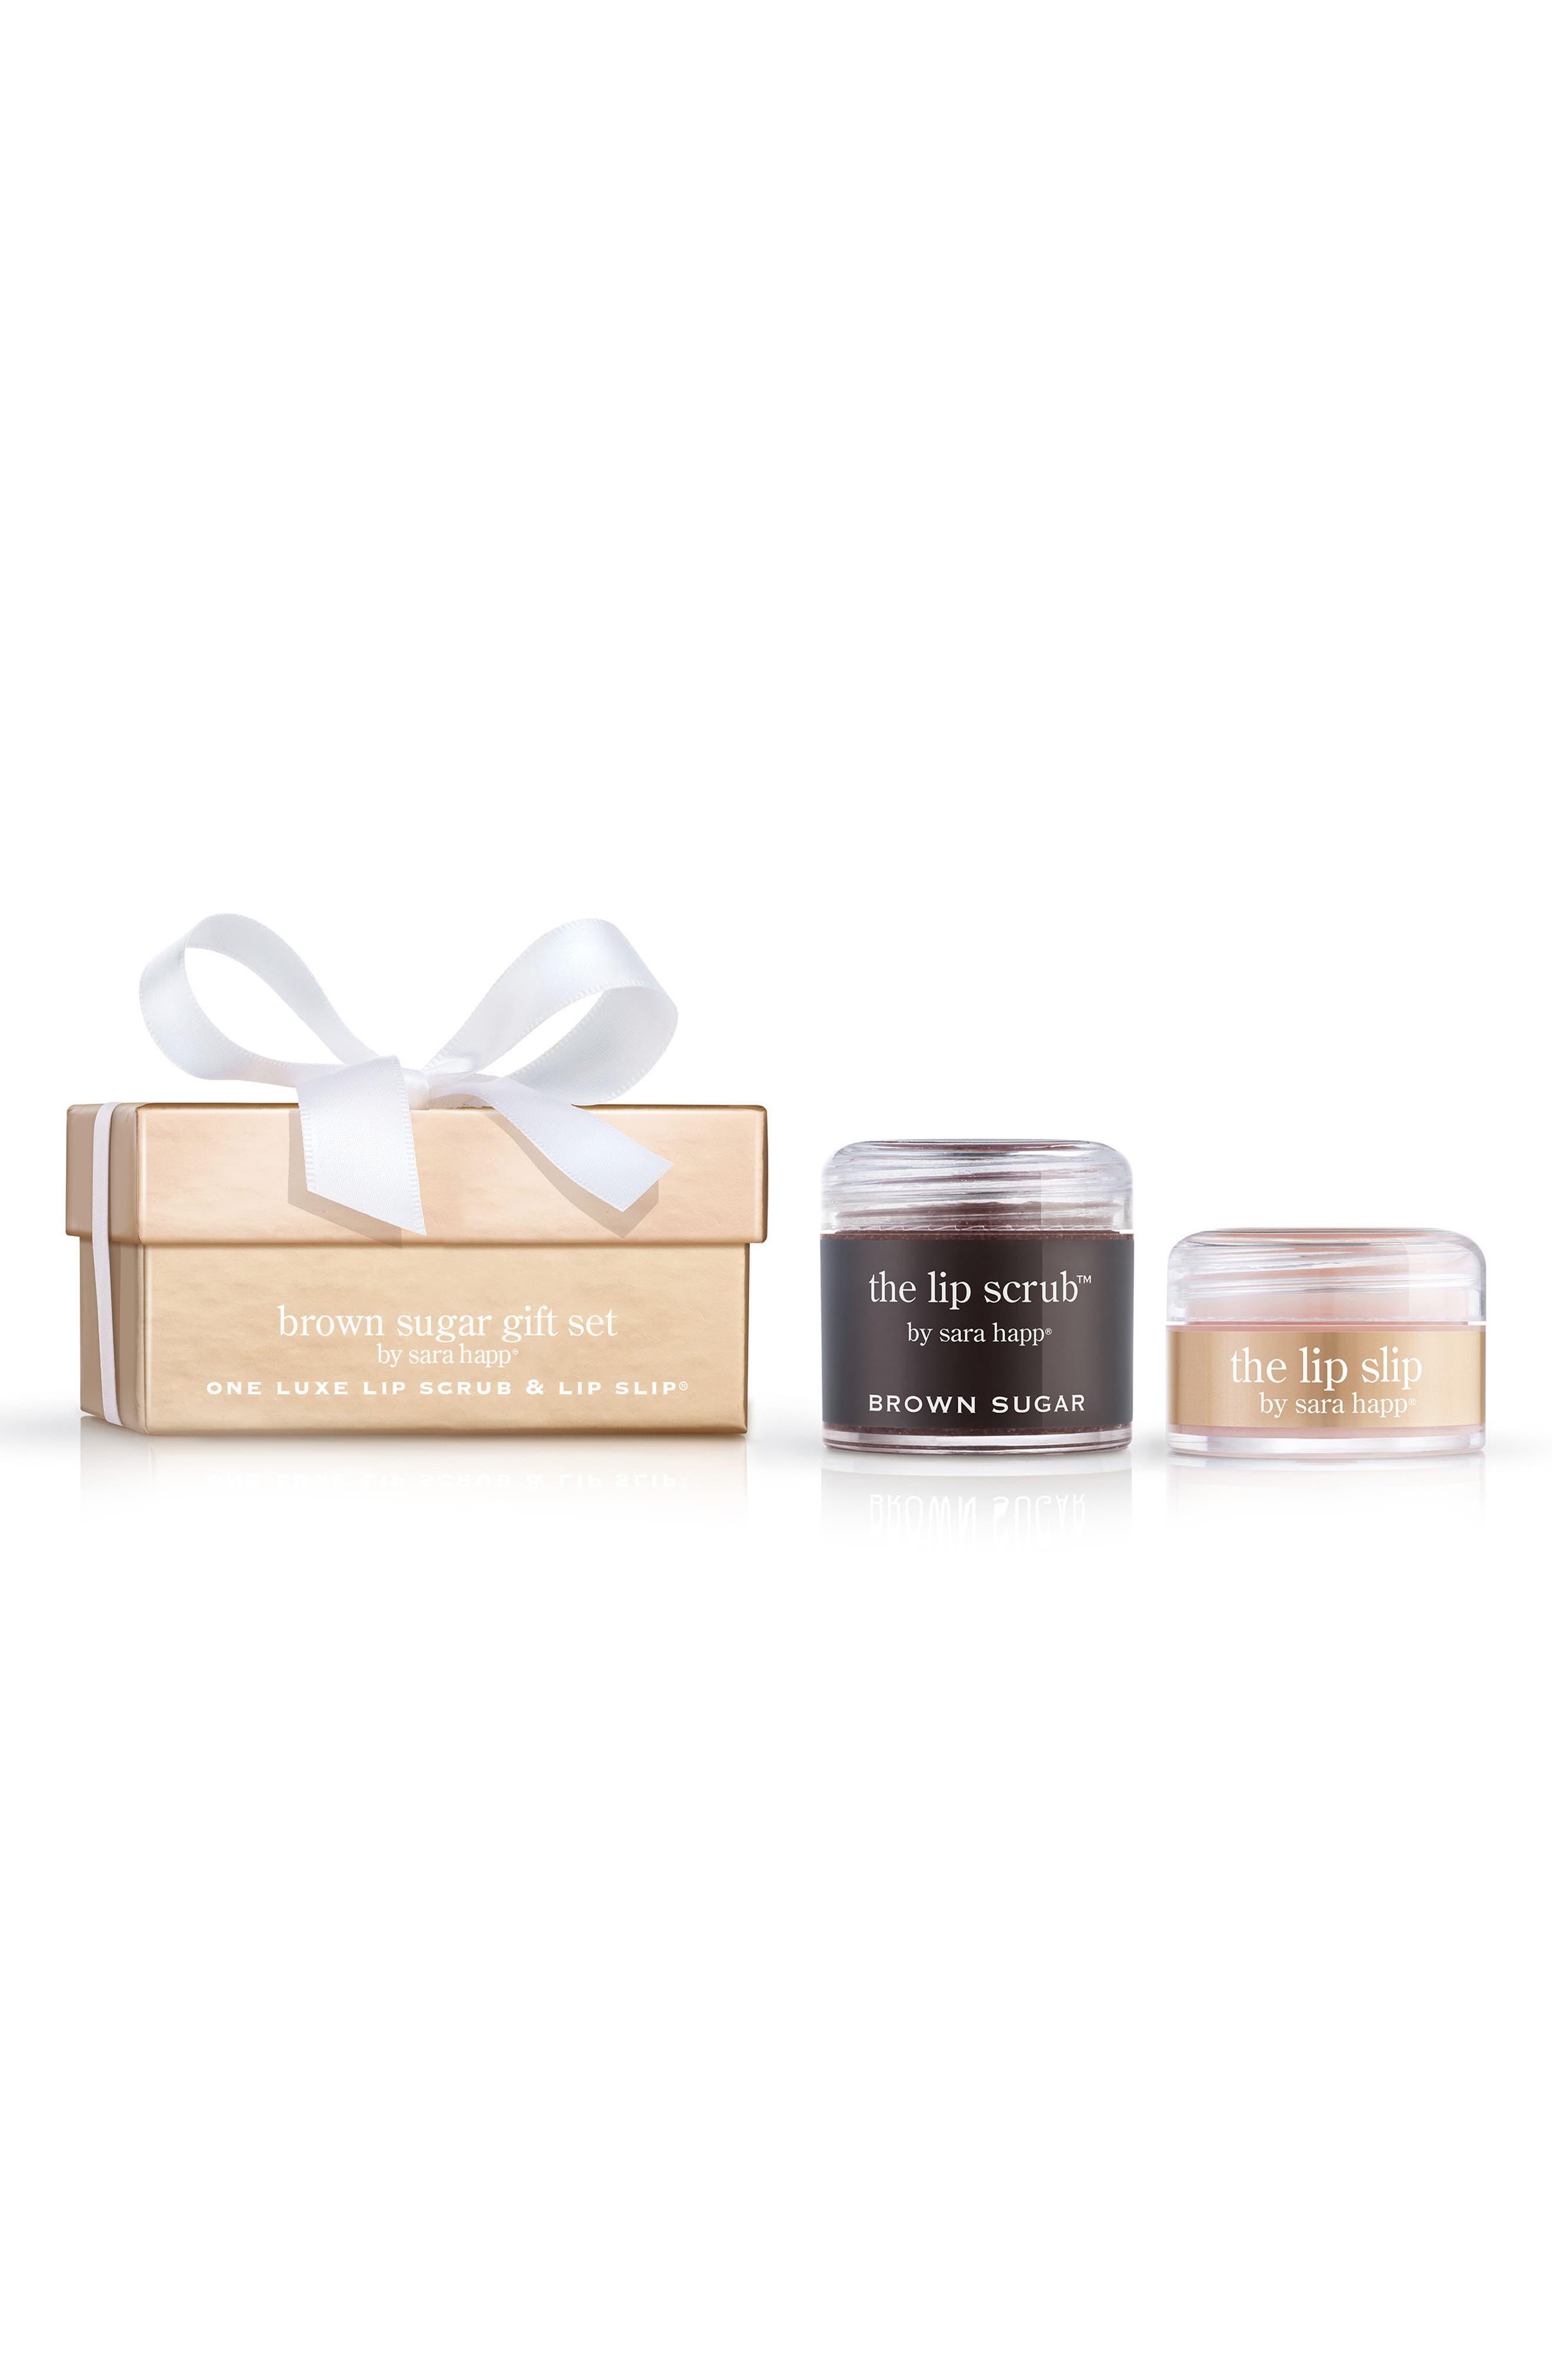 sara happ® Brown Sugar Gift Set ($48 Value)